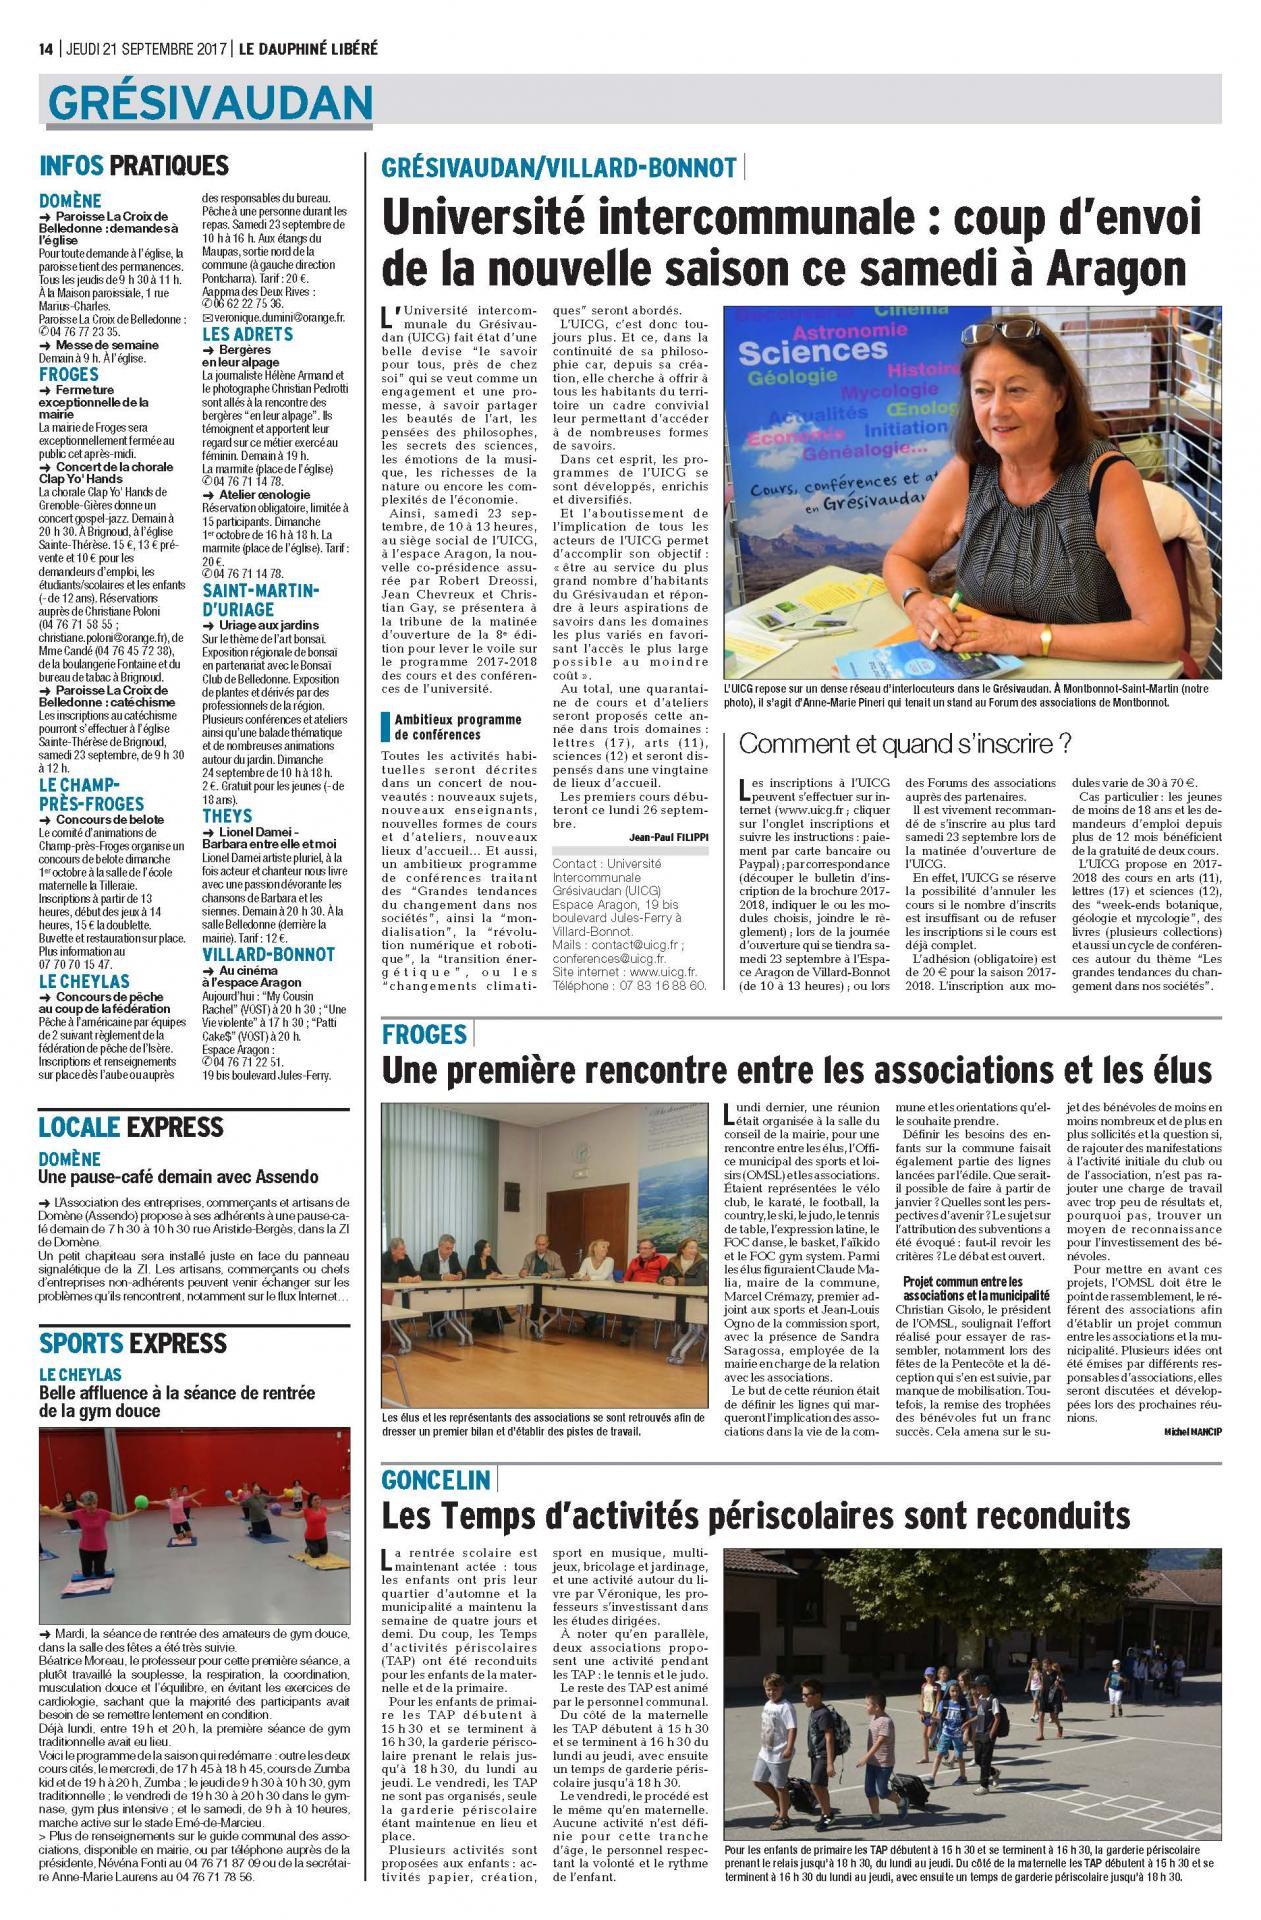 Dl 2017 09 21 page 14 edition grenoble gresivaudan